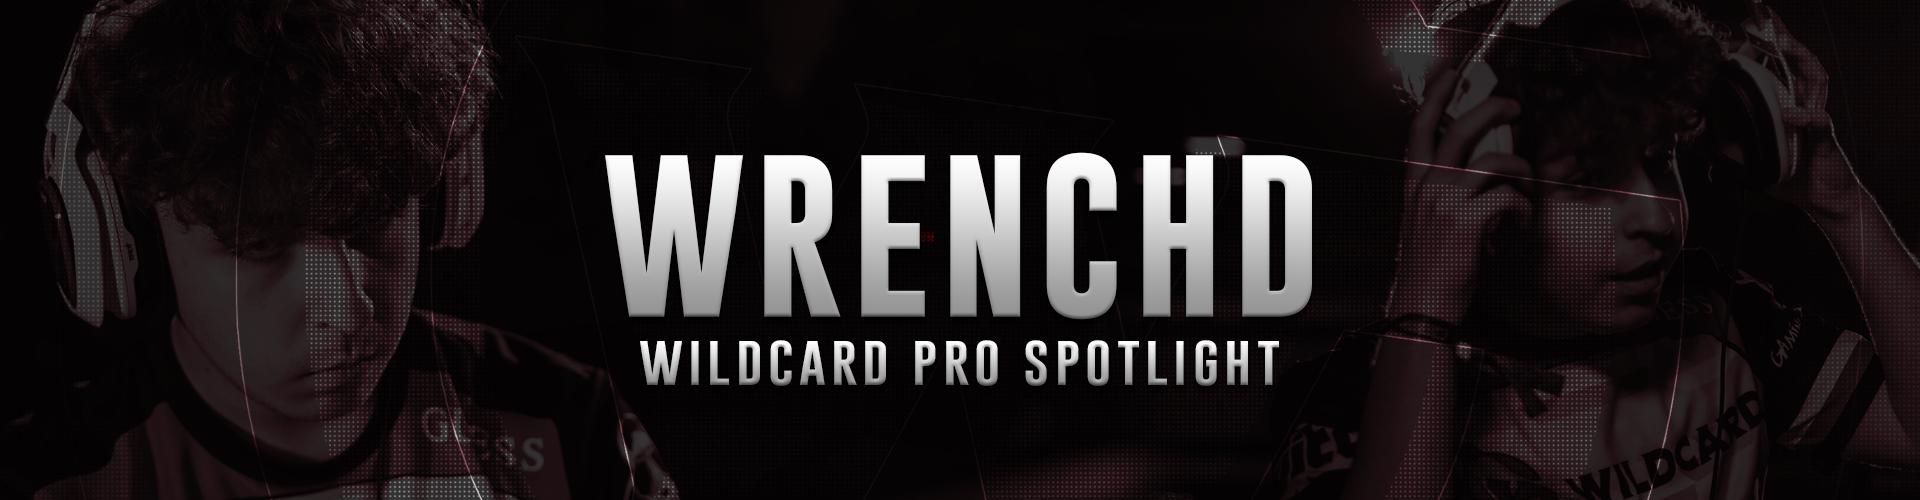 Pro Spotlight: Wrenchd